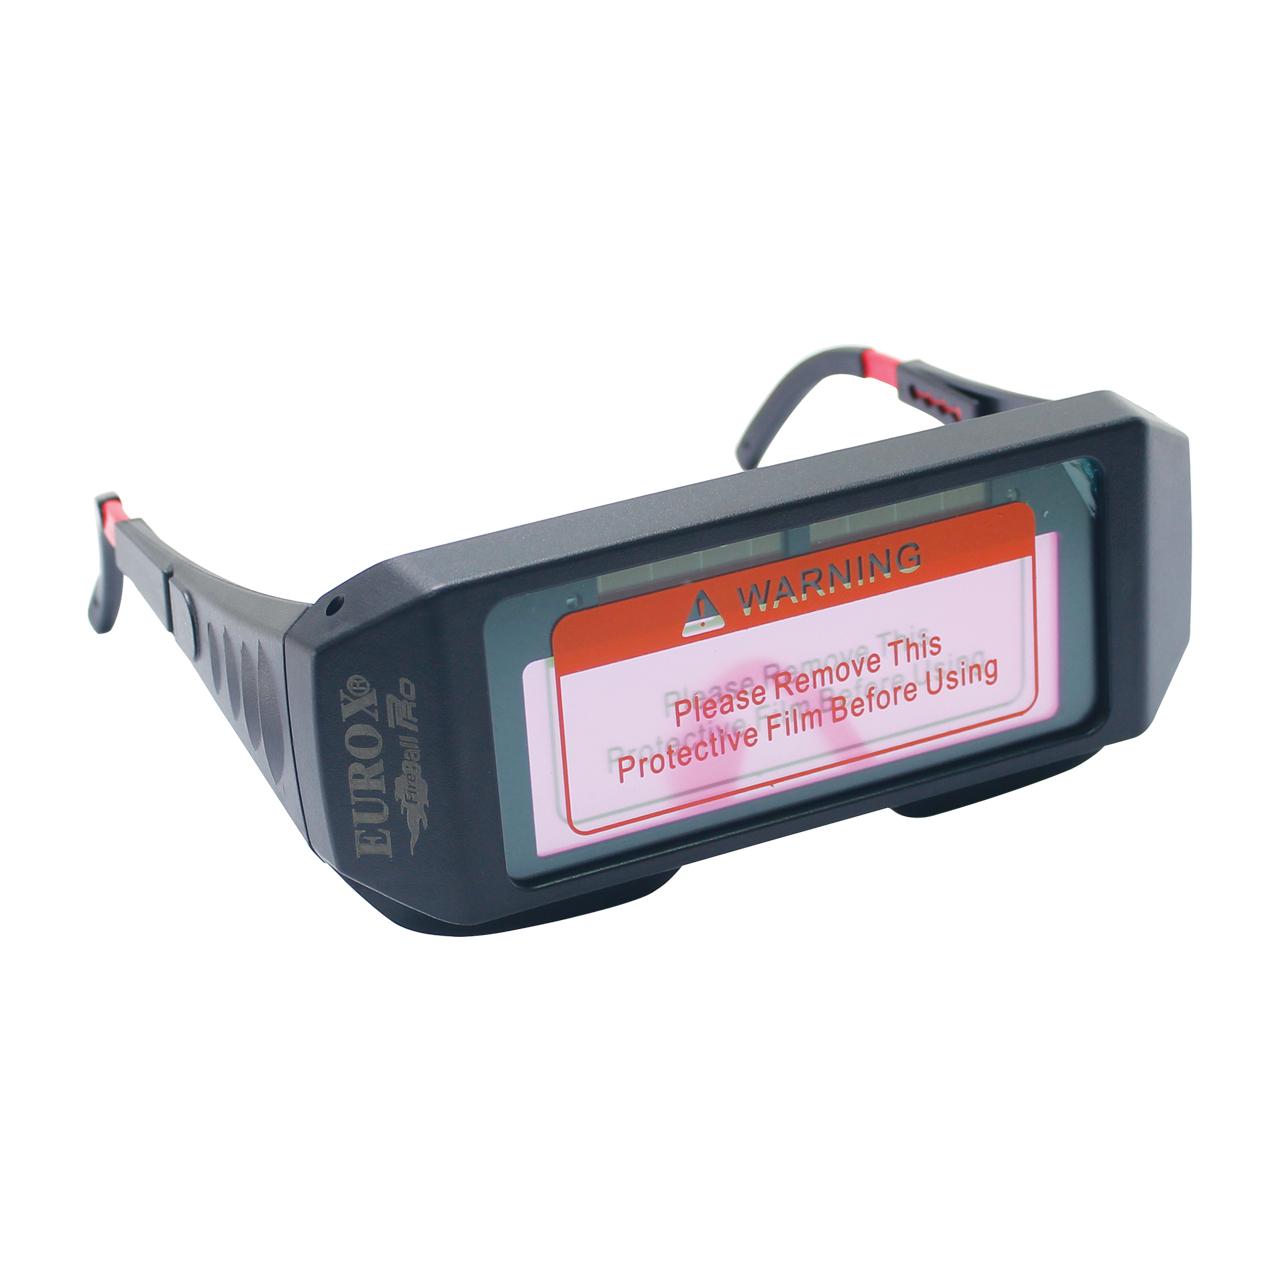 EUROX แว่นตาเชื่อมปรับเลนส์อัตโนมัติ (AUTO)